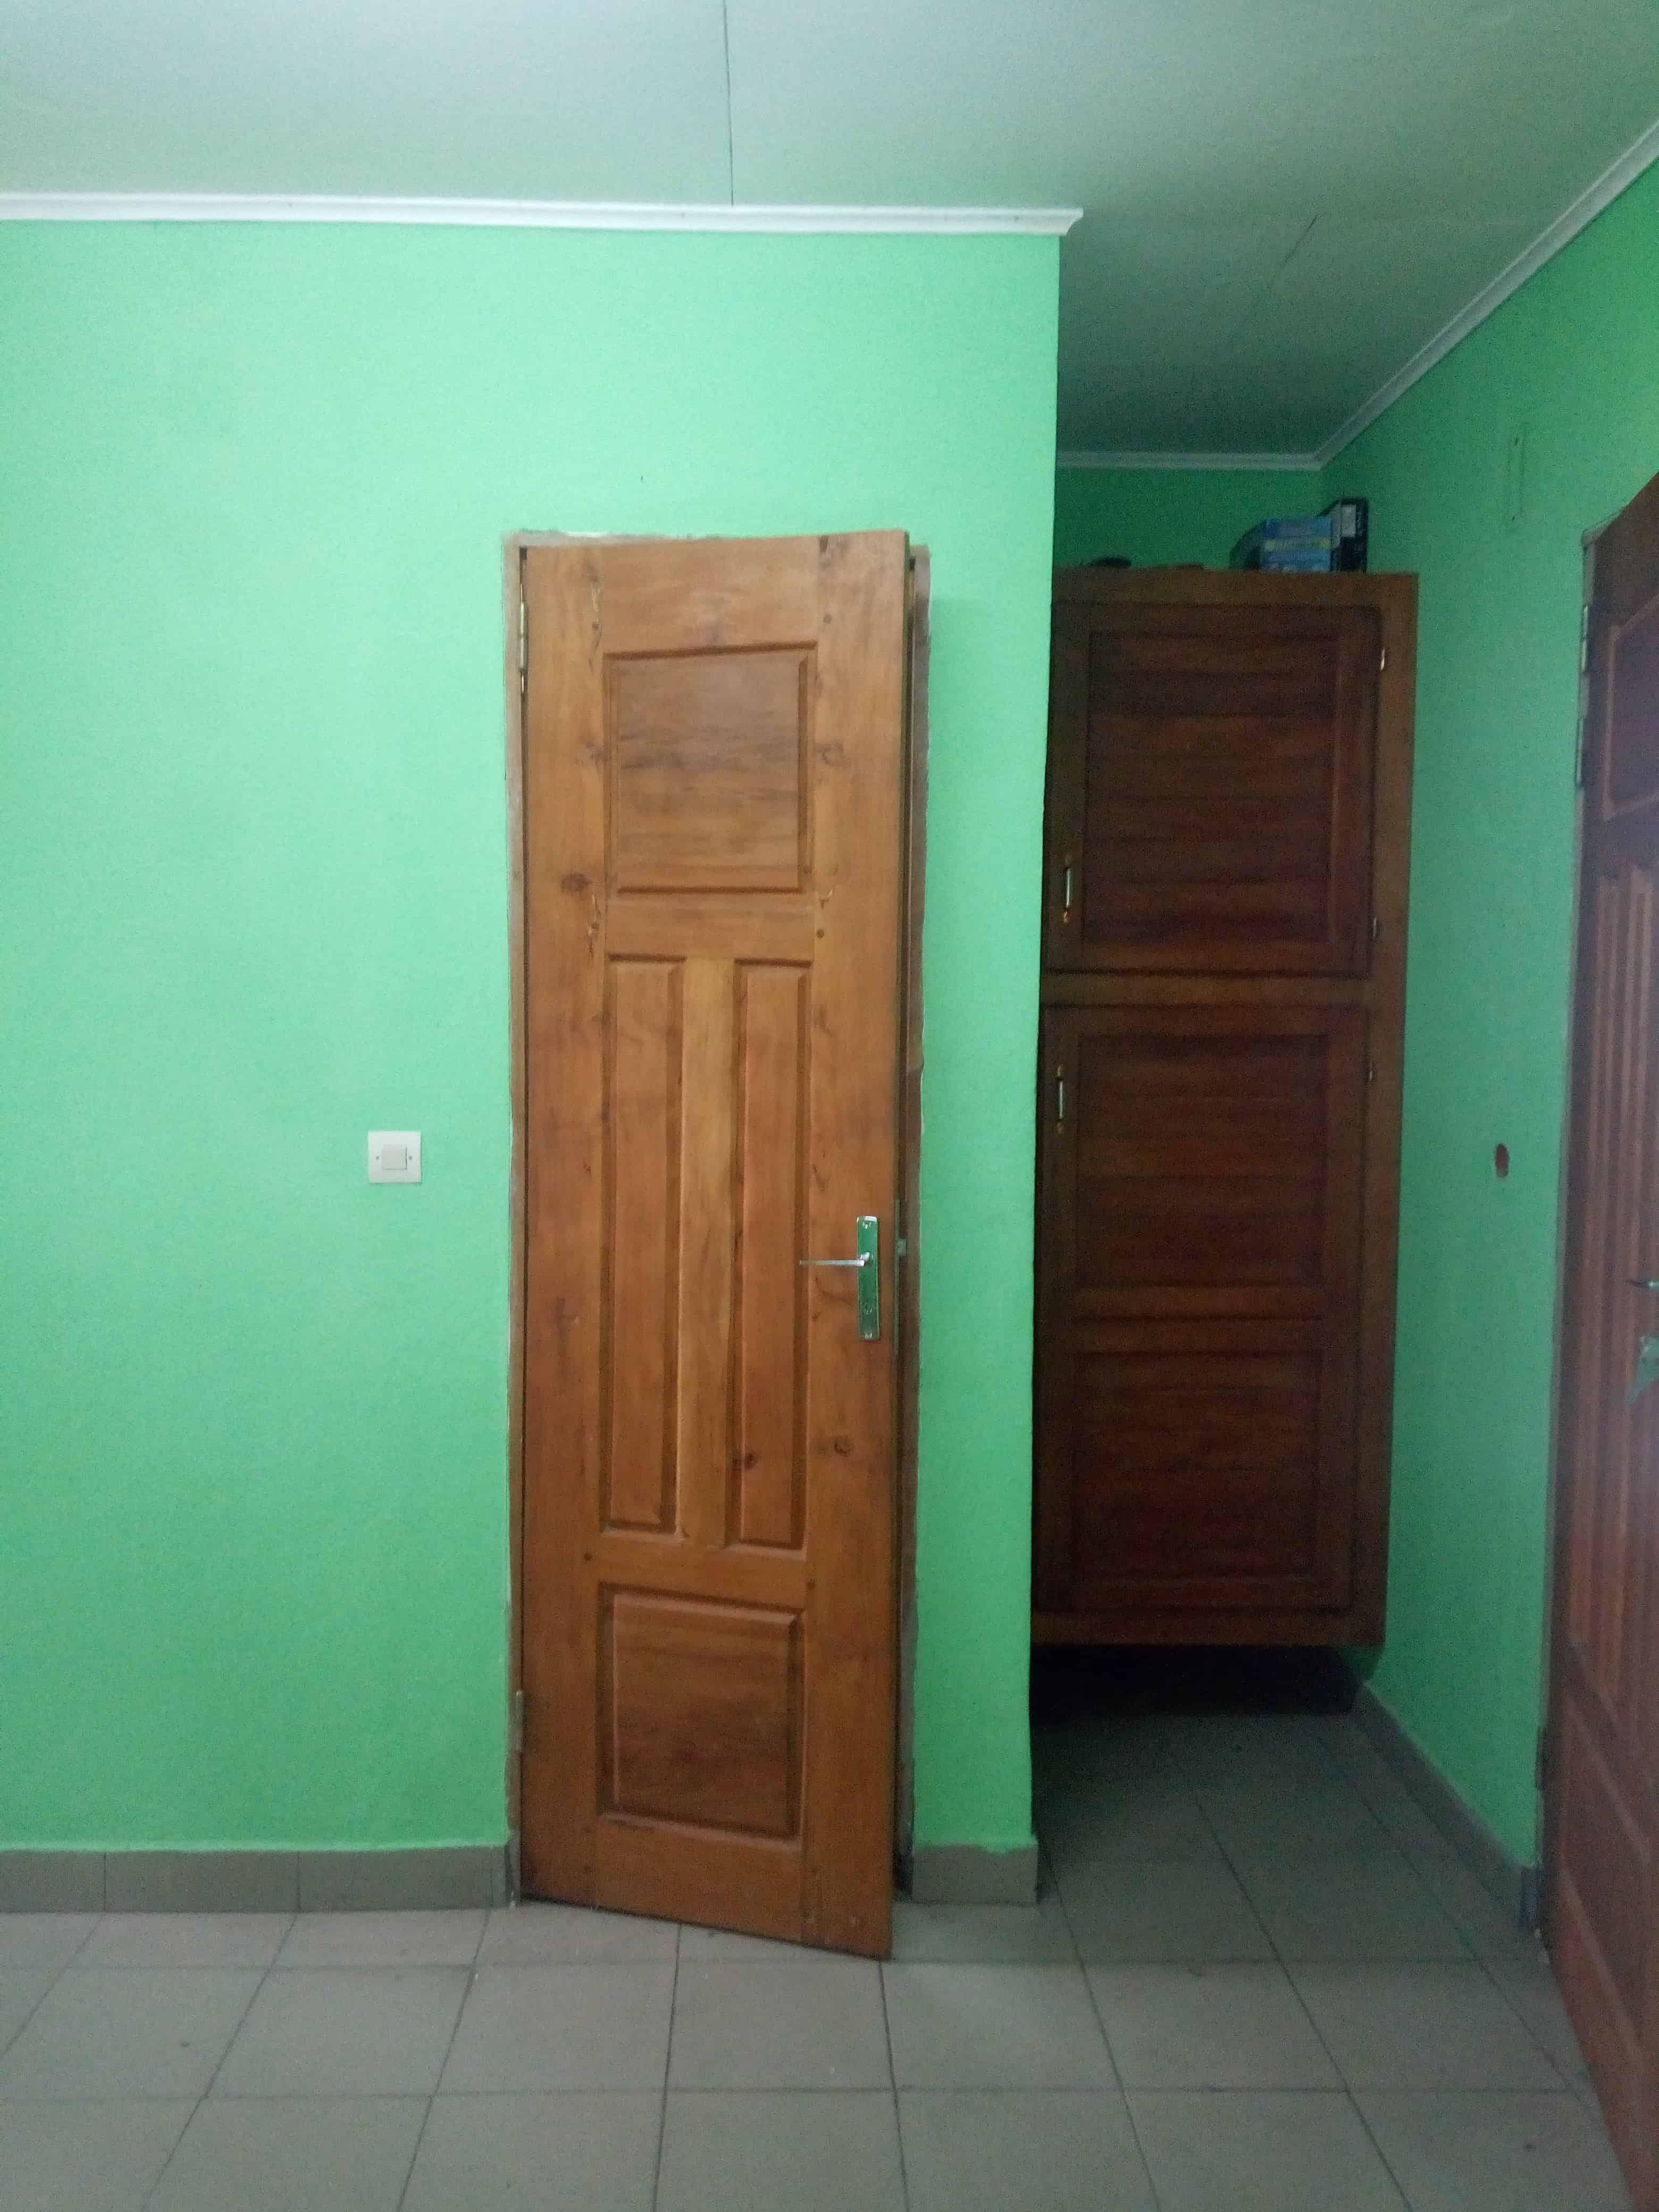 Studio to rent - Douala, Makepe, Rond pauleng - 35 000 FCFA / month